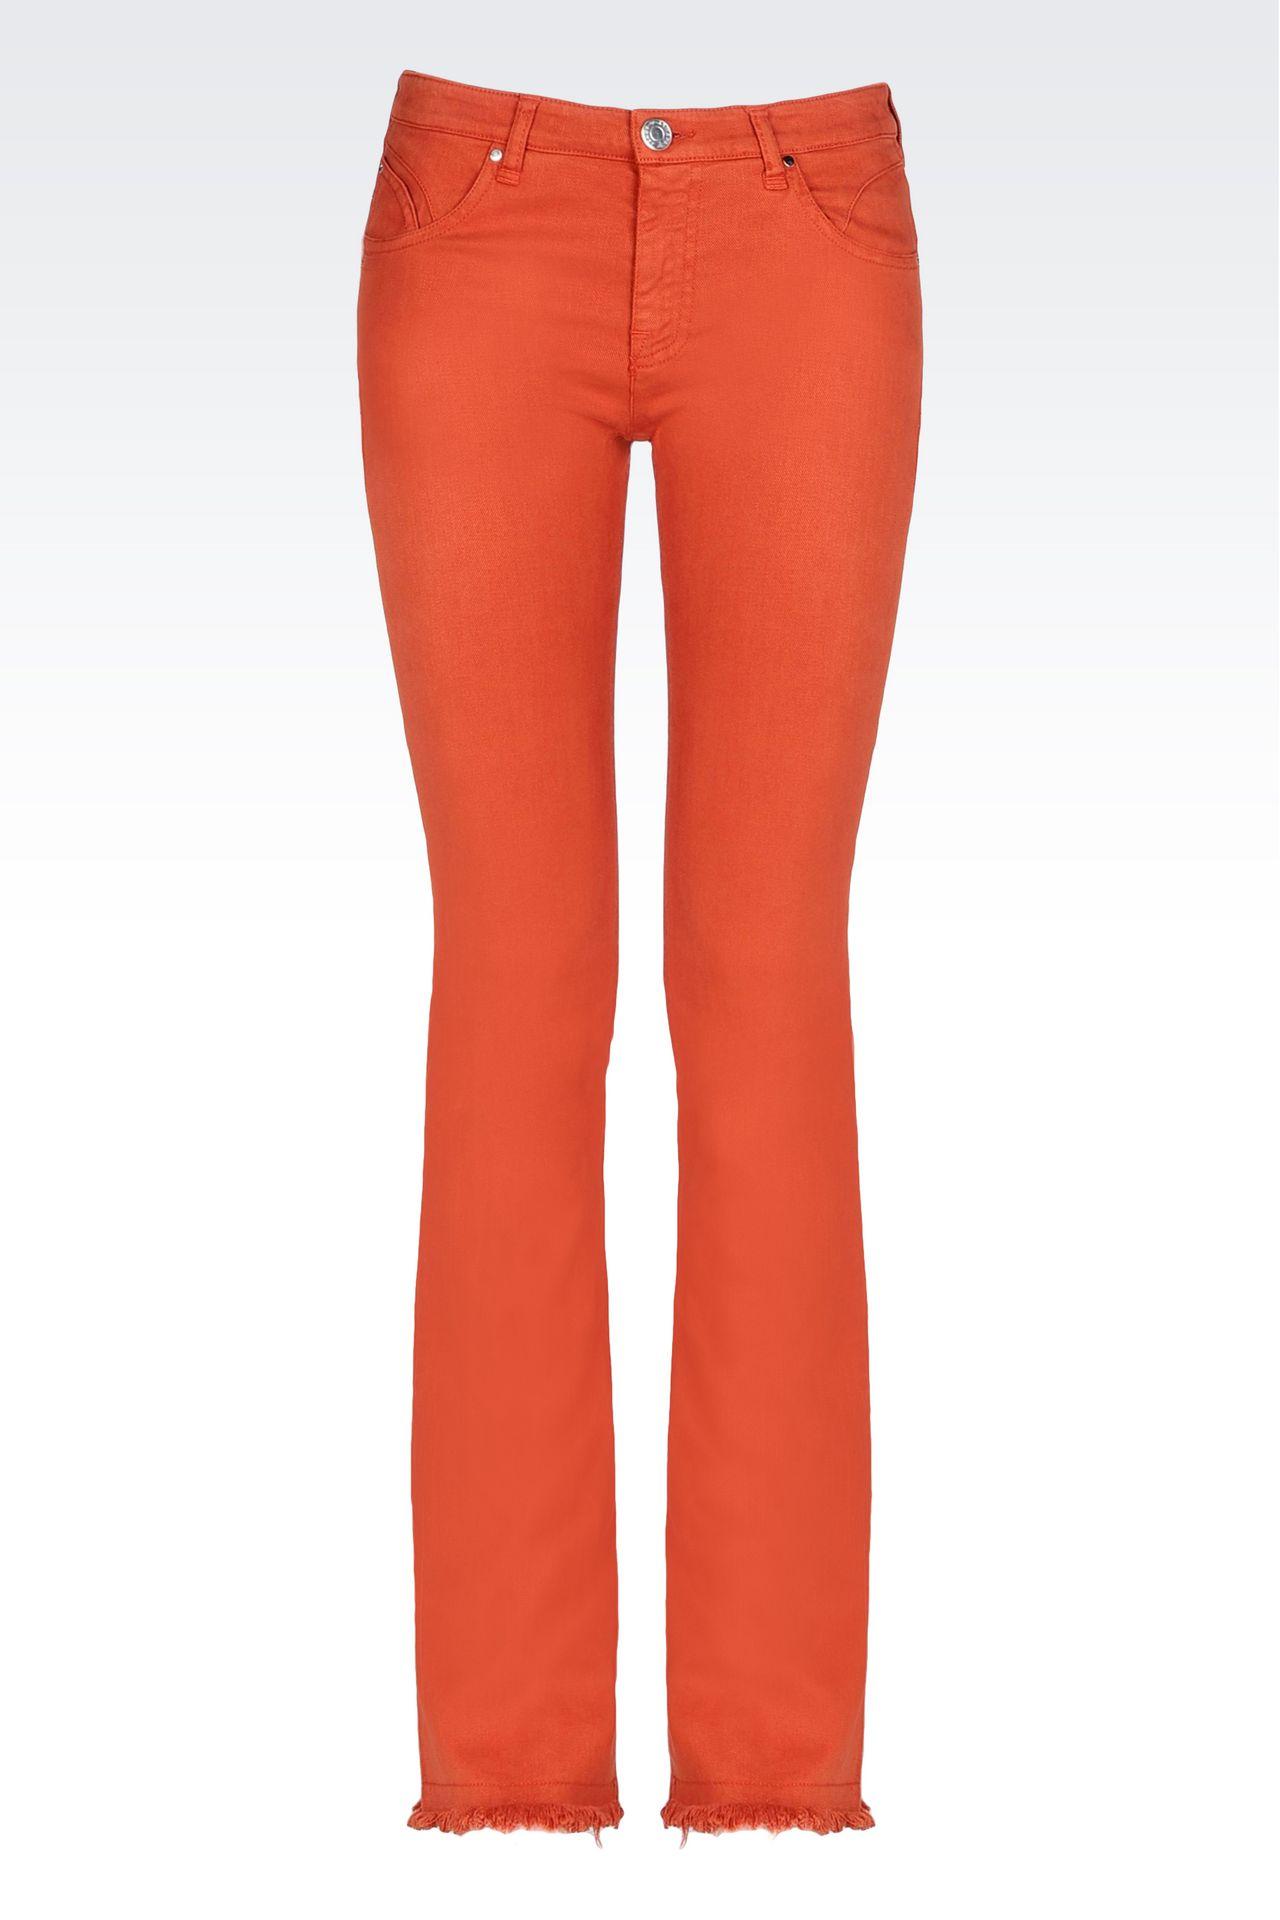 SLIM FIT FLARE VINTAGE LOOK JEANS: Jeans Women by Armani - 0